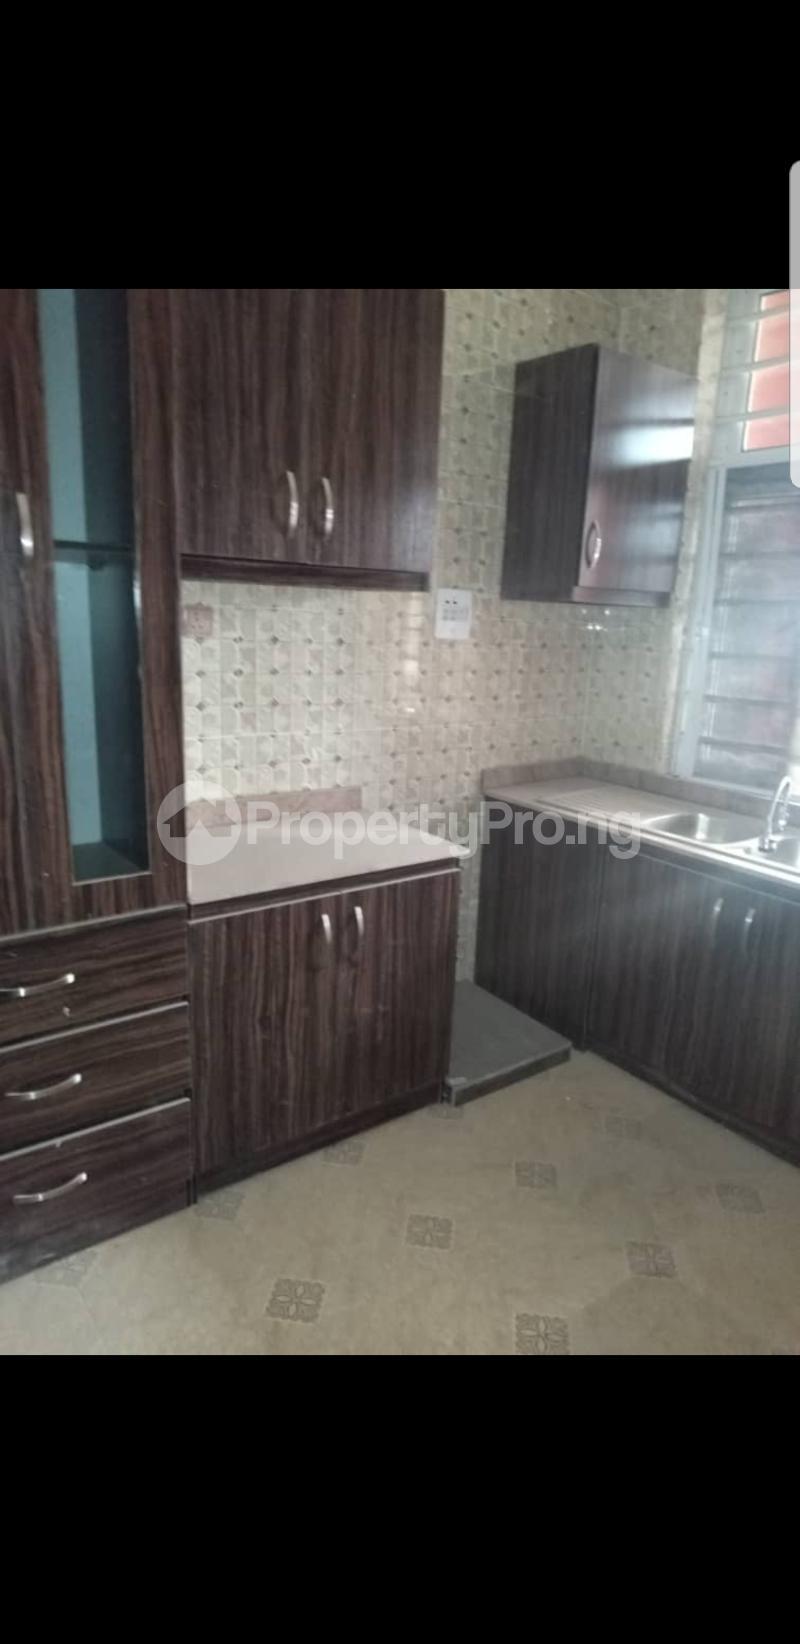 3 bedroom Shared Apartment Flat / Apartment for rent Enugu Enugu - 4